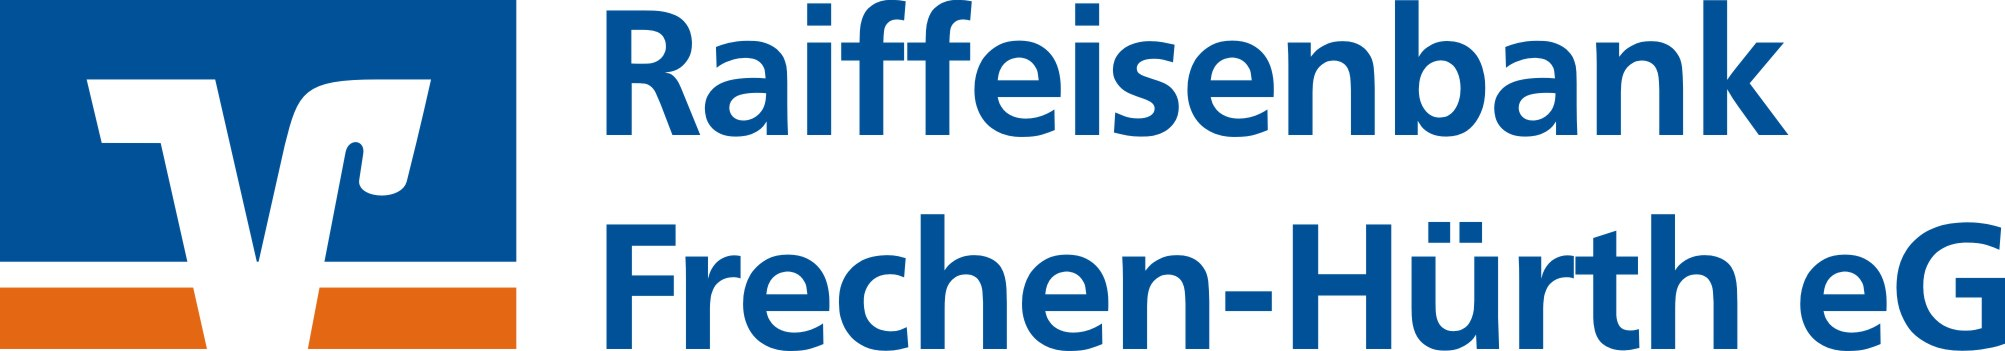 Raiffeisenbank Frechen-Hürth eG, Geschäftsstelle Worringen